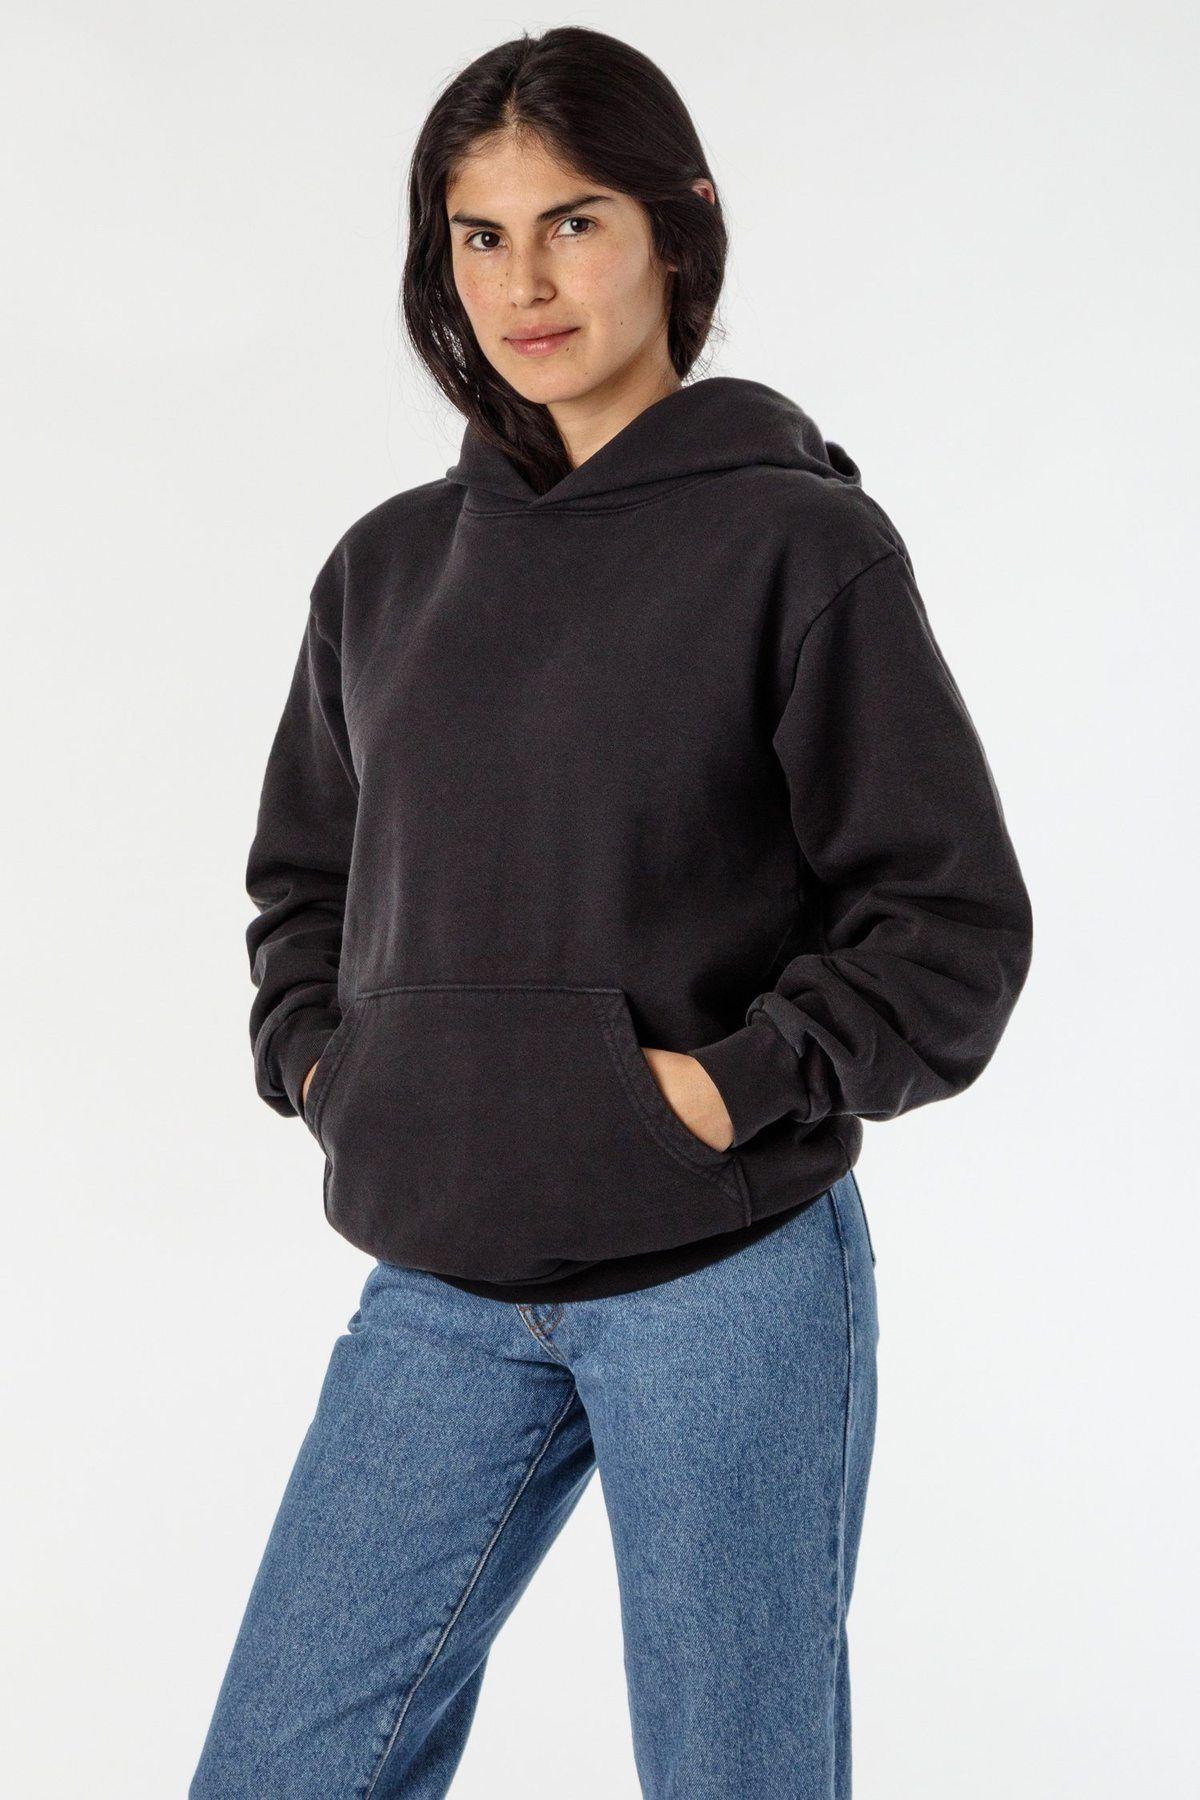 Hf09gd Unisex Garment Dye 14oz Heavy Fleece Hooded Pullover Sweatshirt Hooded Pullover Garment Dye Pullover Sweatshirt